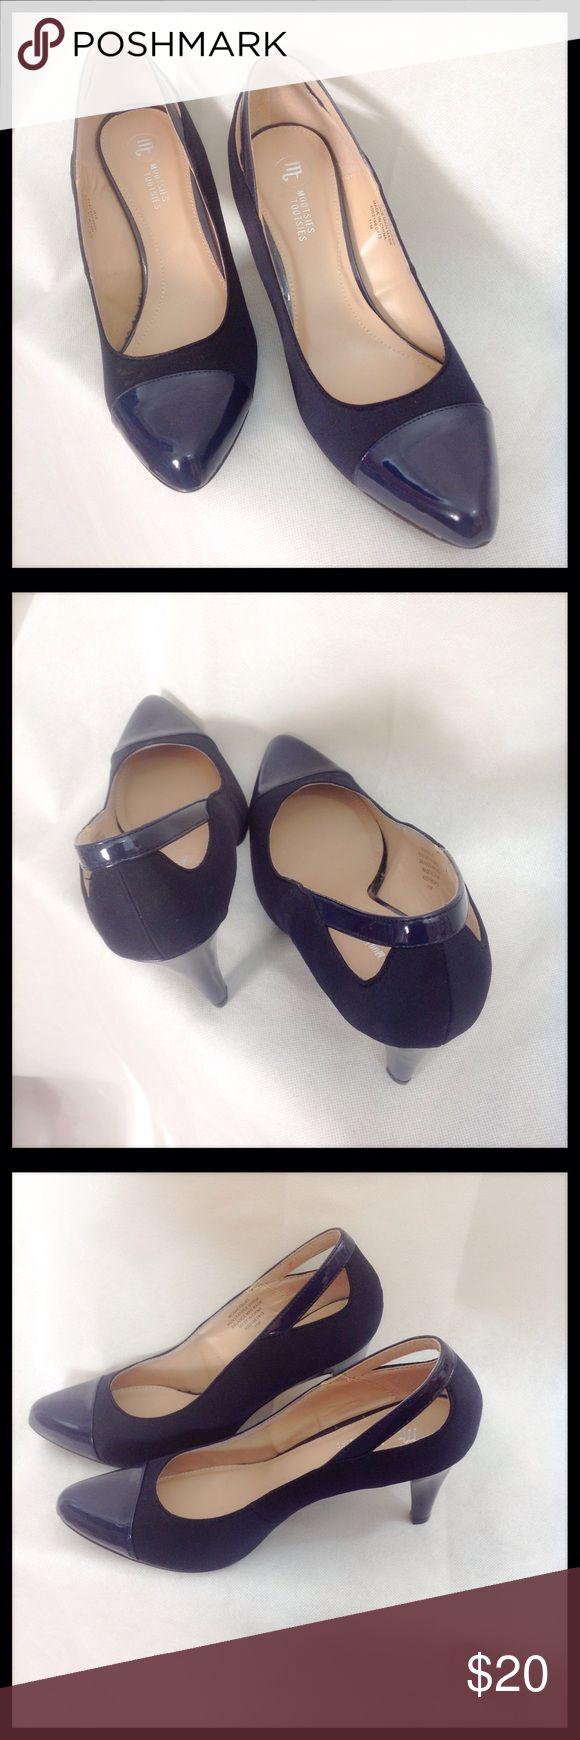 "Mootsies Tootsies Navy Heels - NWOT Mootsies Tootsies navy heels. NWOT. Small chip in bottom of left shoe. Heels 3 1/2"". Shoes Heels"